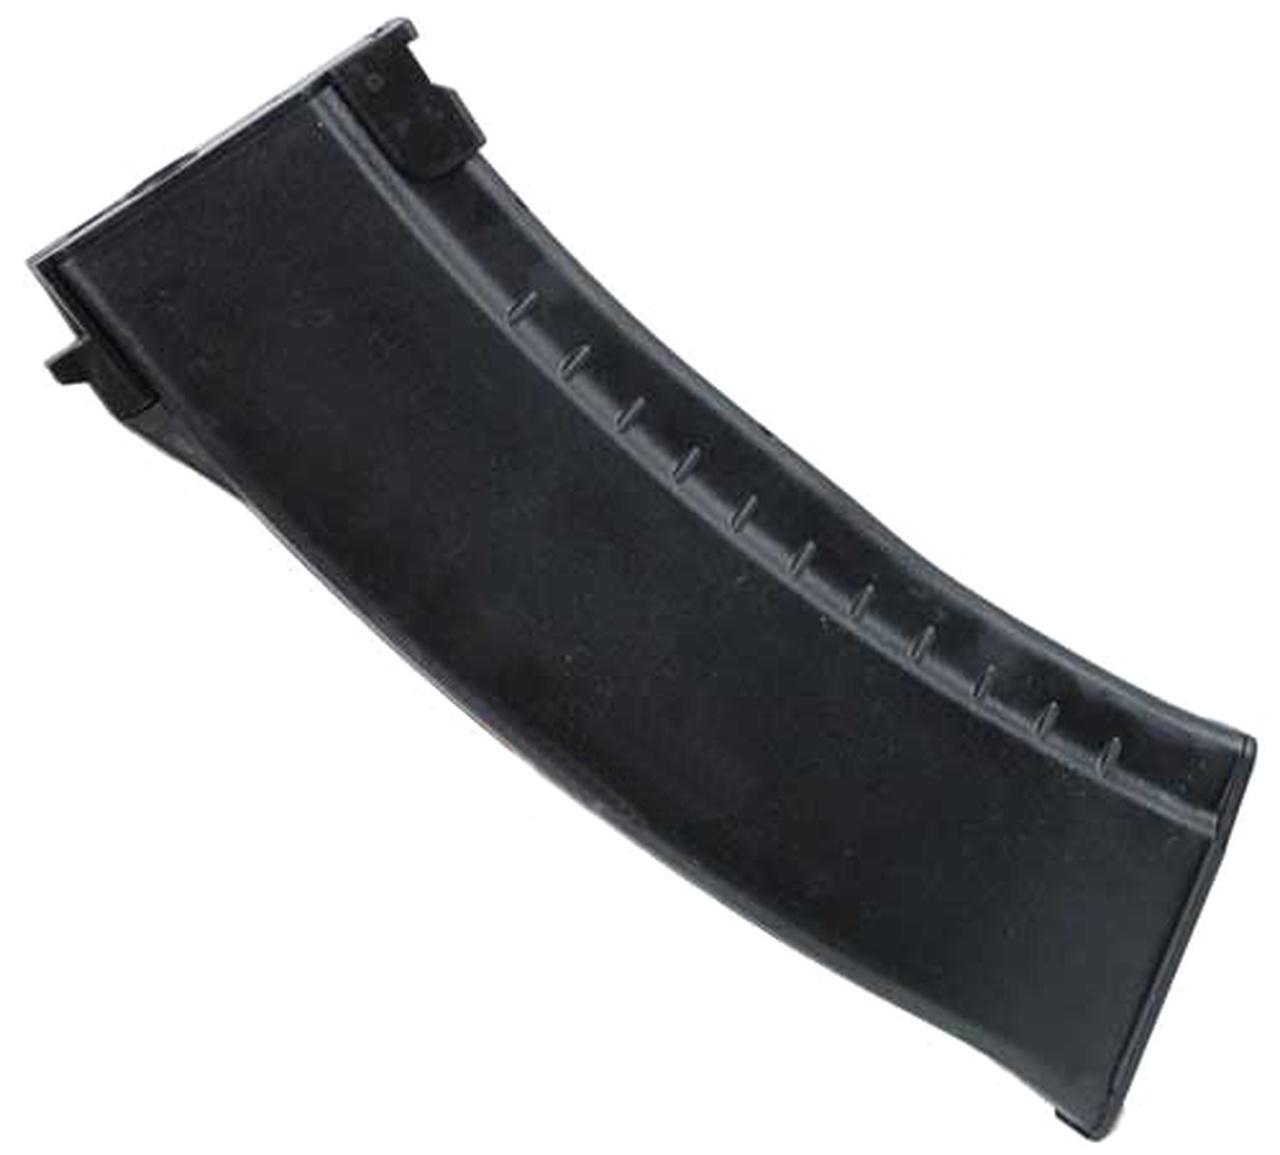 Matrix AK74-Style Magazine for AK Series Airsoft Rifle - 140 round midcap black